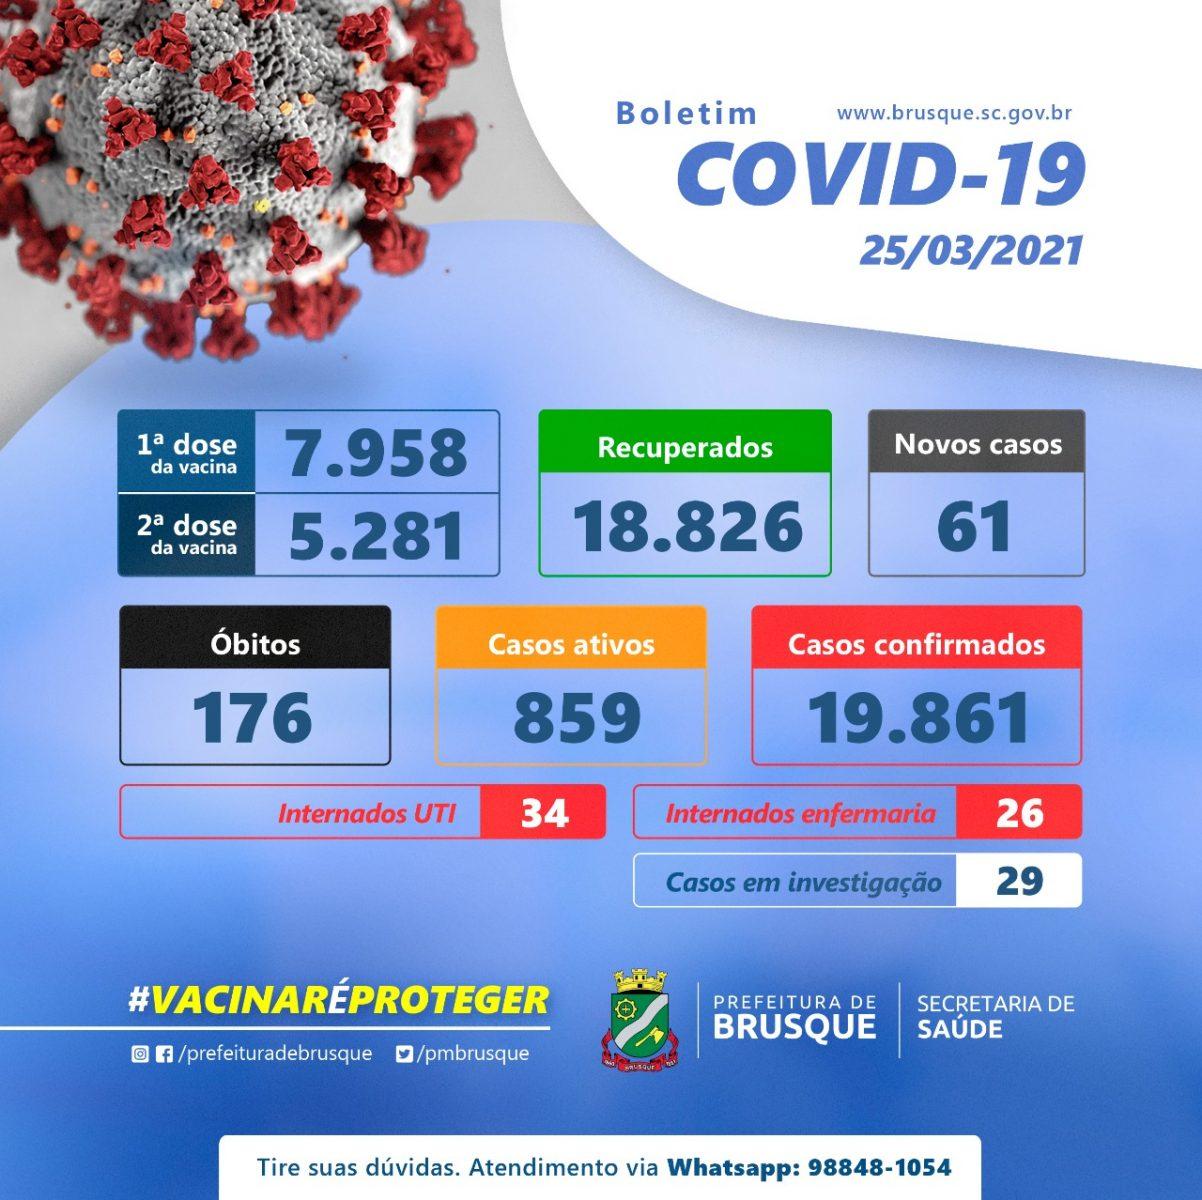 Covid-19: Confira o boletim epidemiológico desta quinta-feira (25)